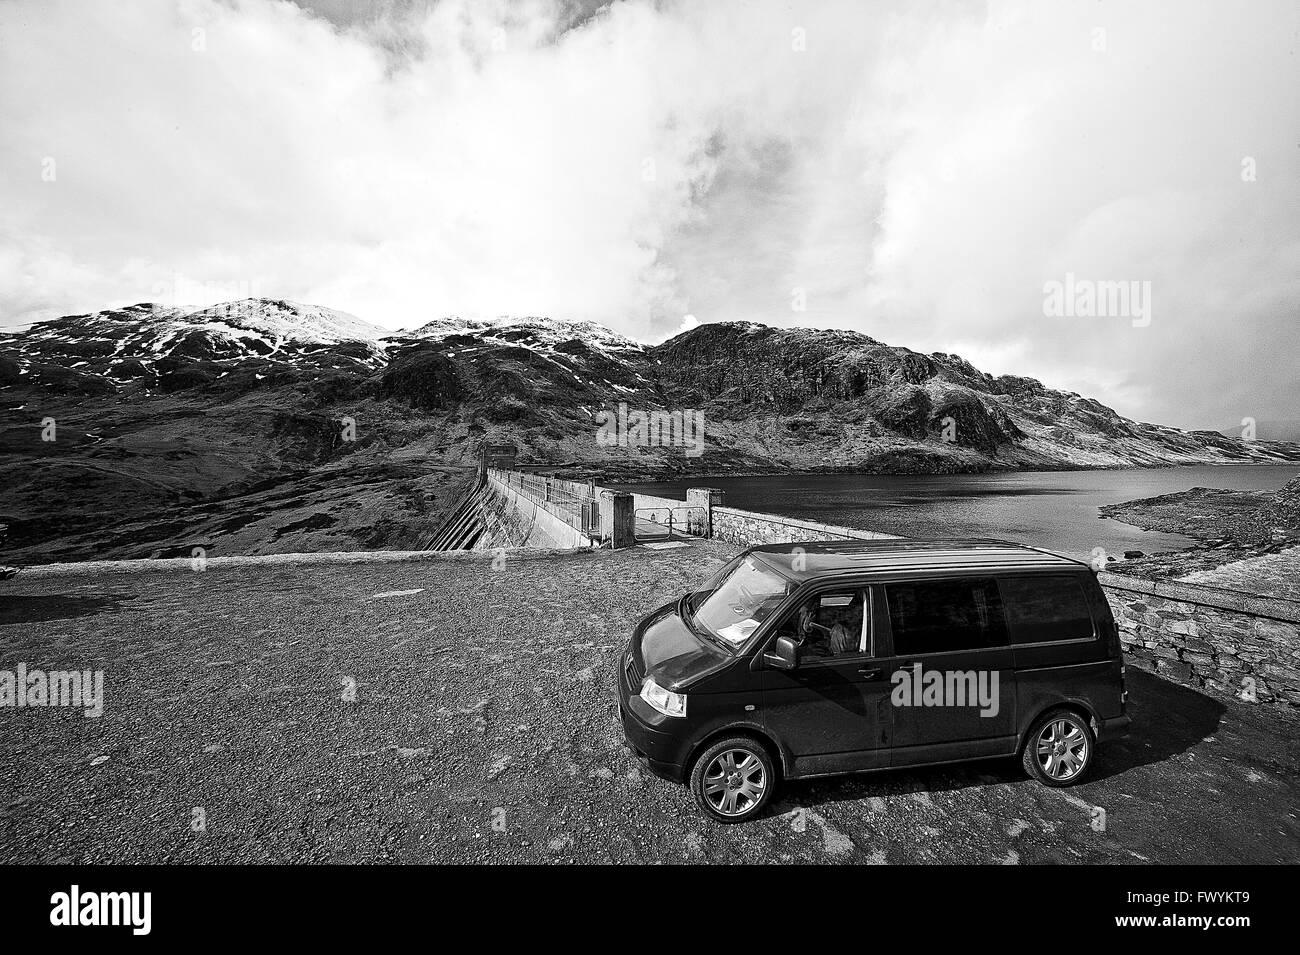 T5, transporter, vanlife, new age, adventure, blue, vw, britain, bus, scotland, highlands, - Stock Image